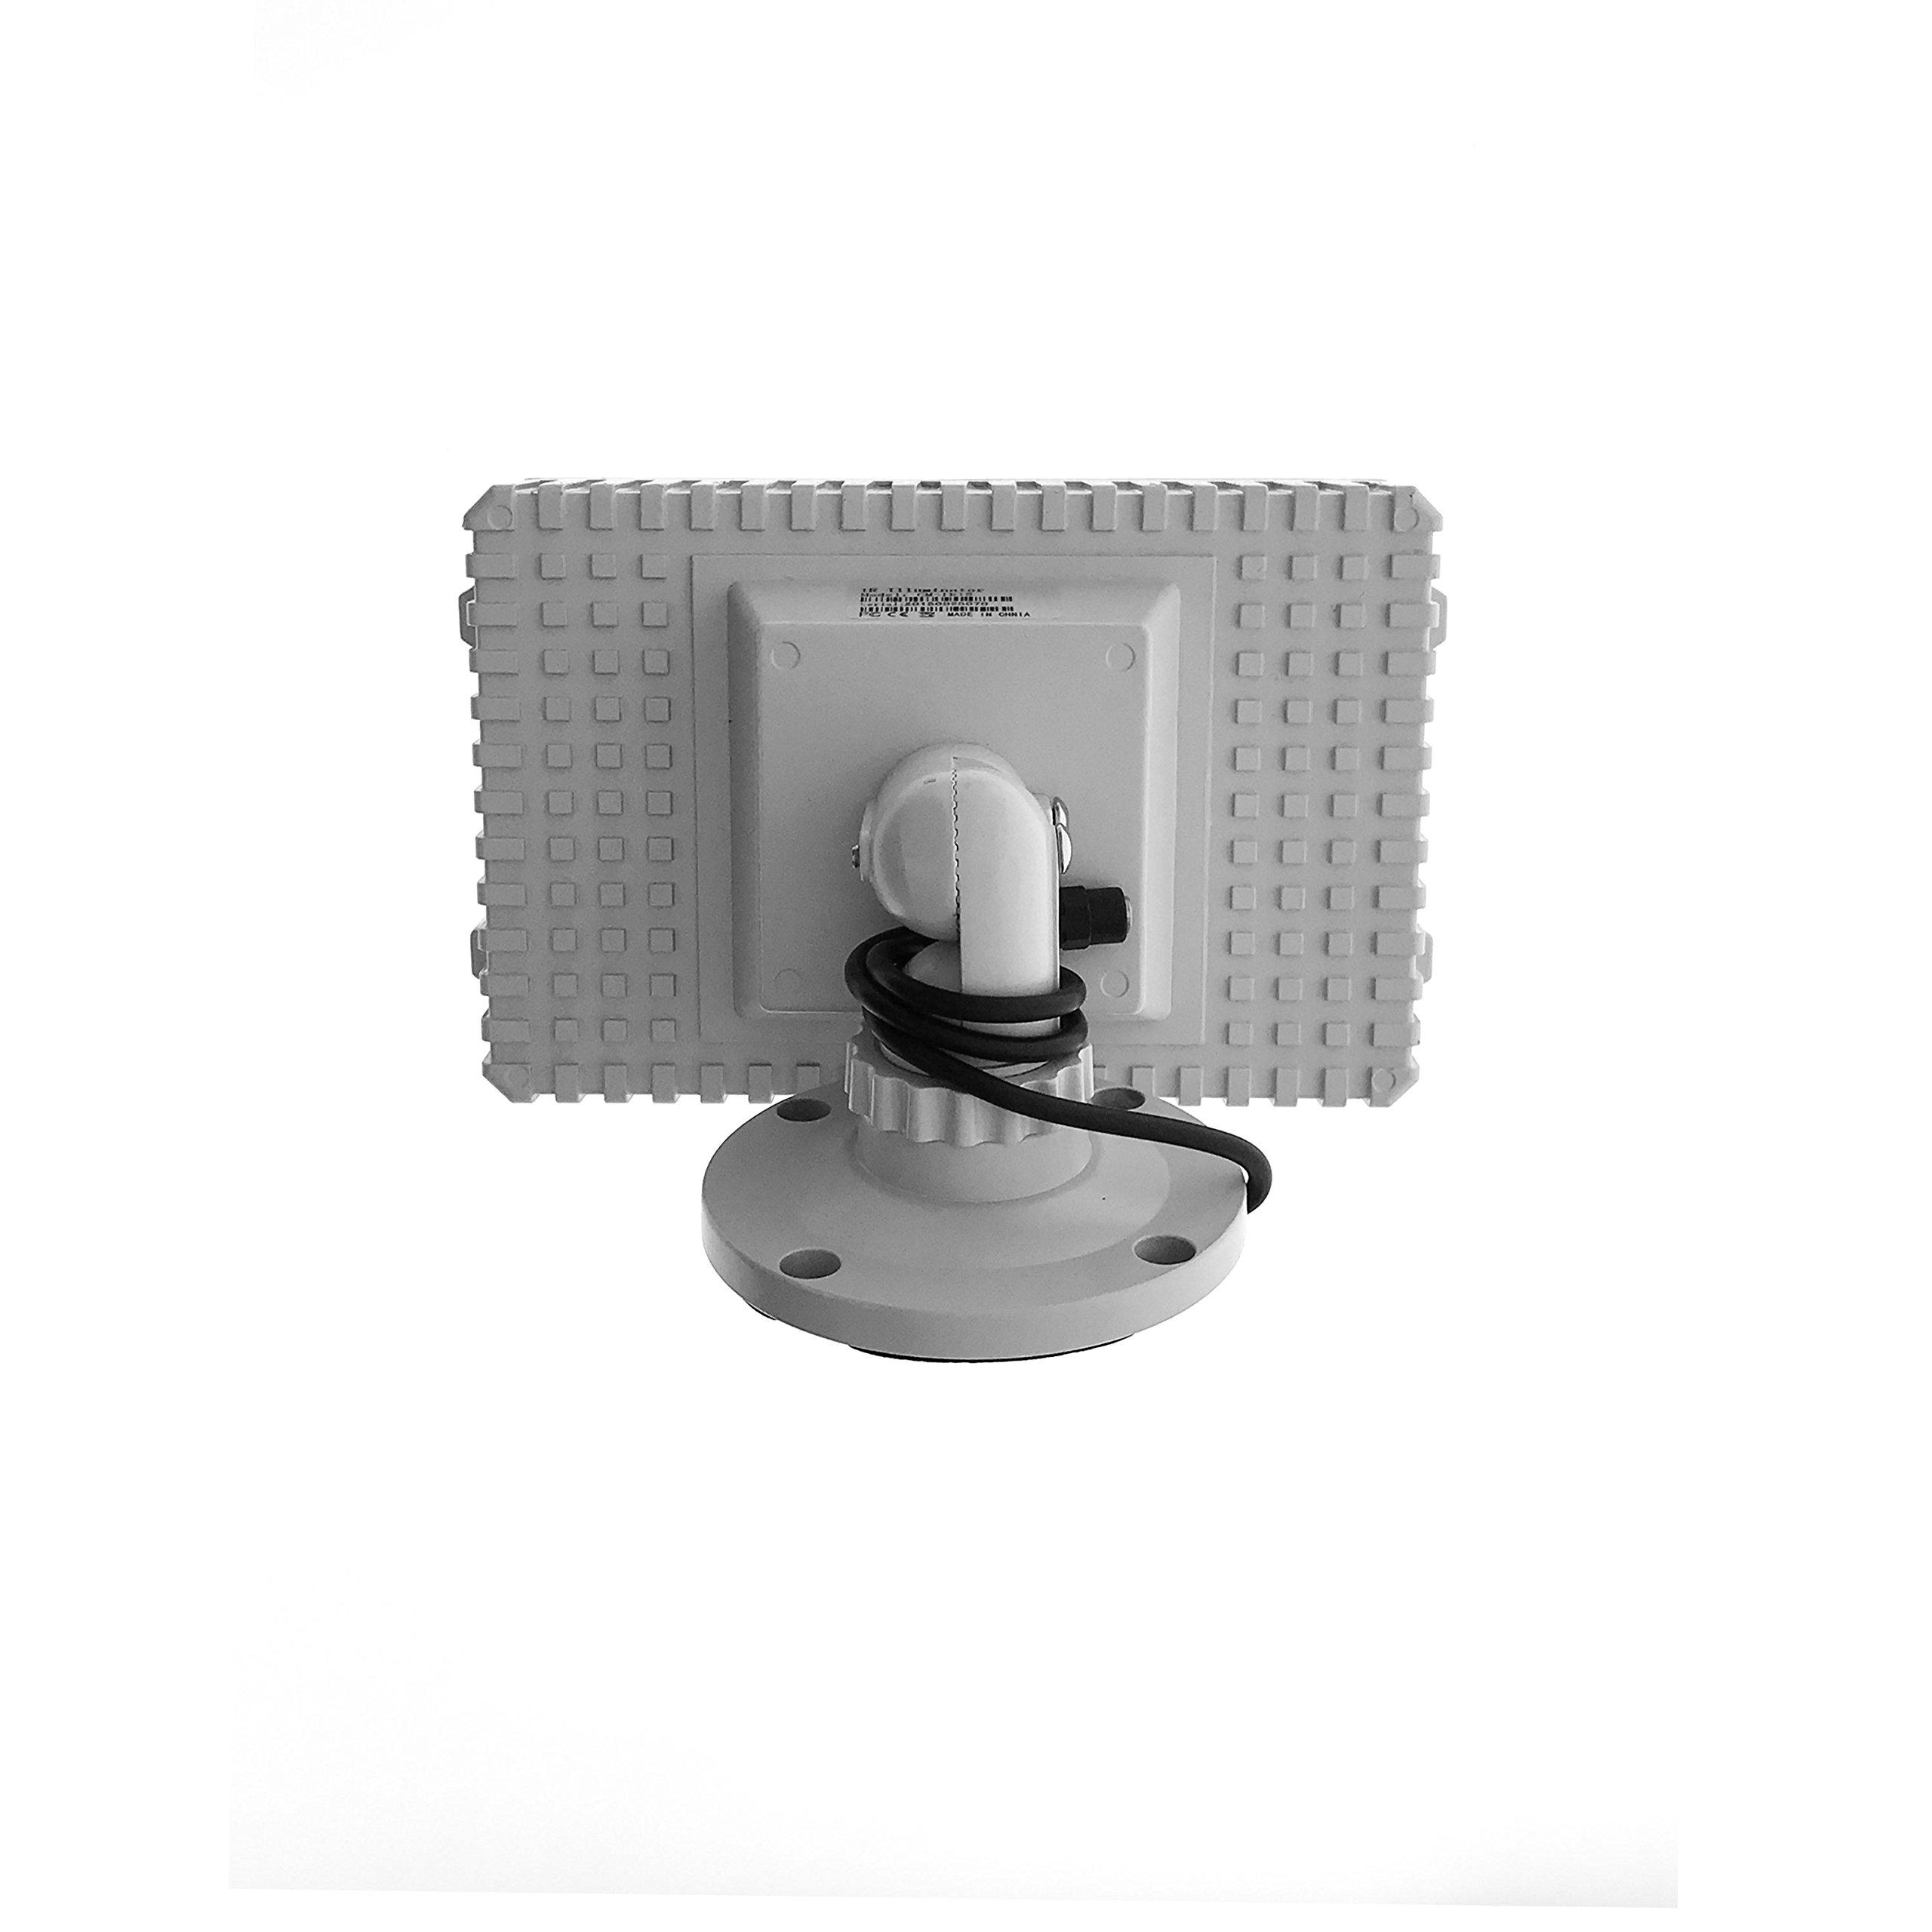 CMVision CMVE-IR15 Wide Angle 60-80° Power LED IR Array Illuminator 200-300' Long Range with Free 12VDC 3A Power Adaptor, 15 Piece by CMVision (Image #3)